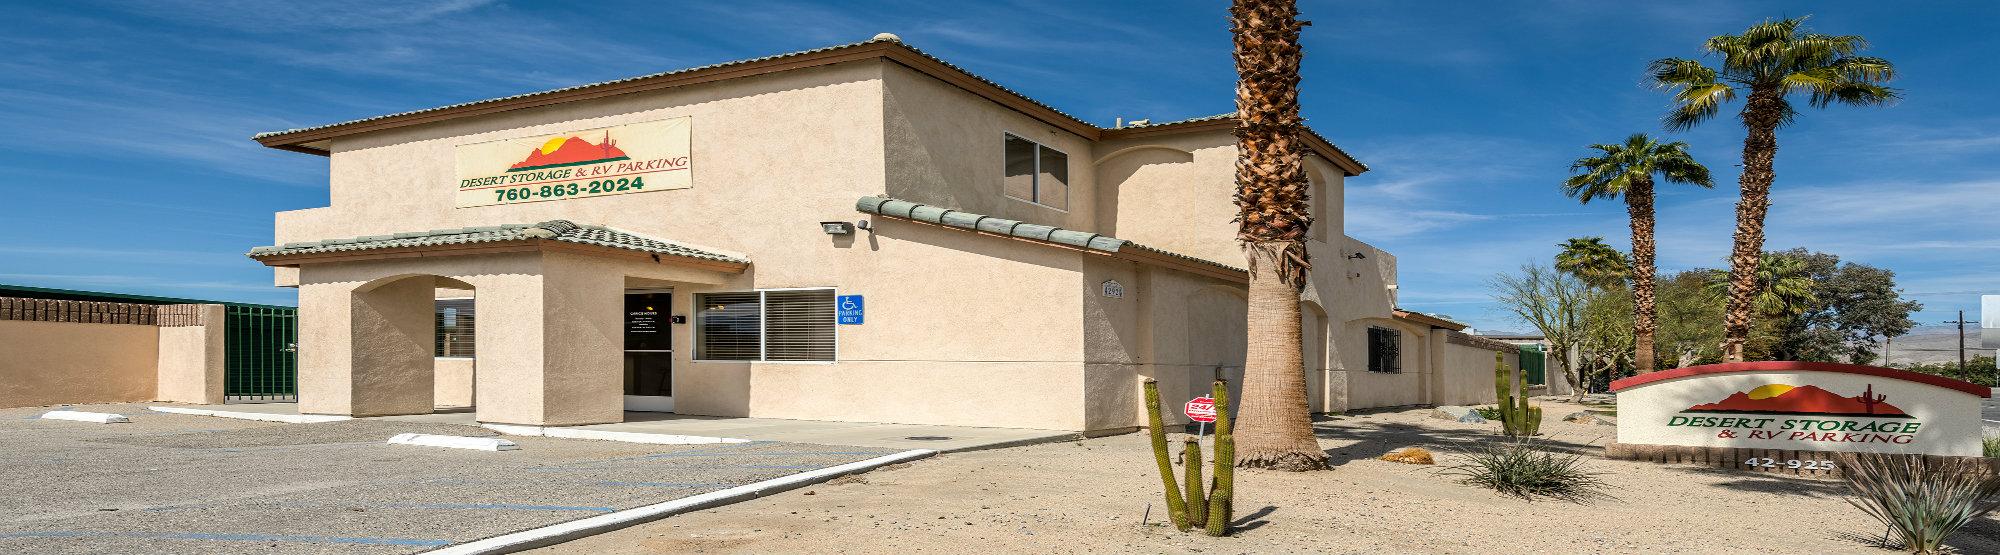 Desert Storage Entrance Indio, CA